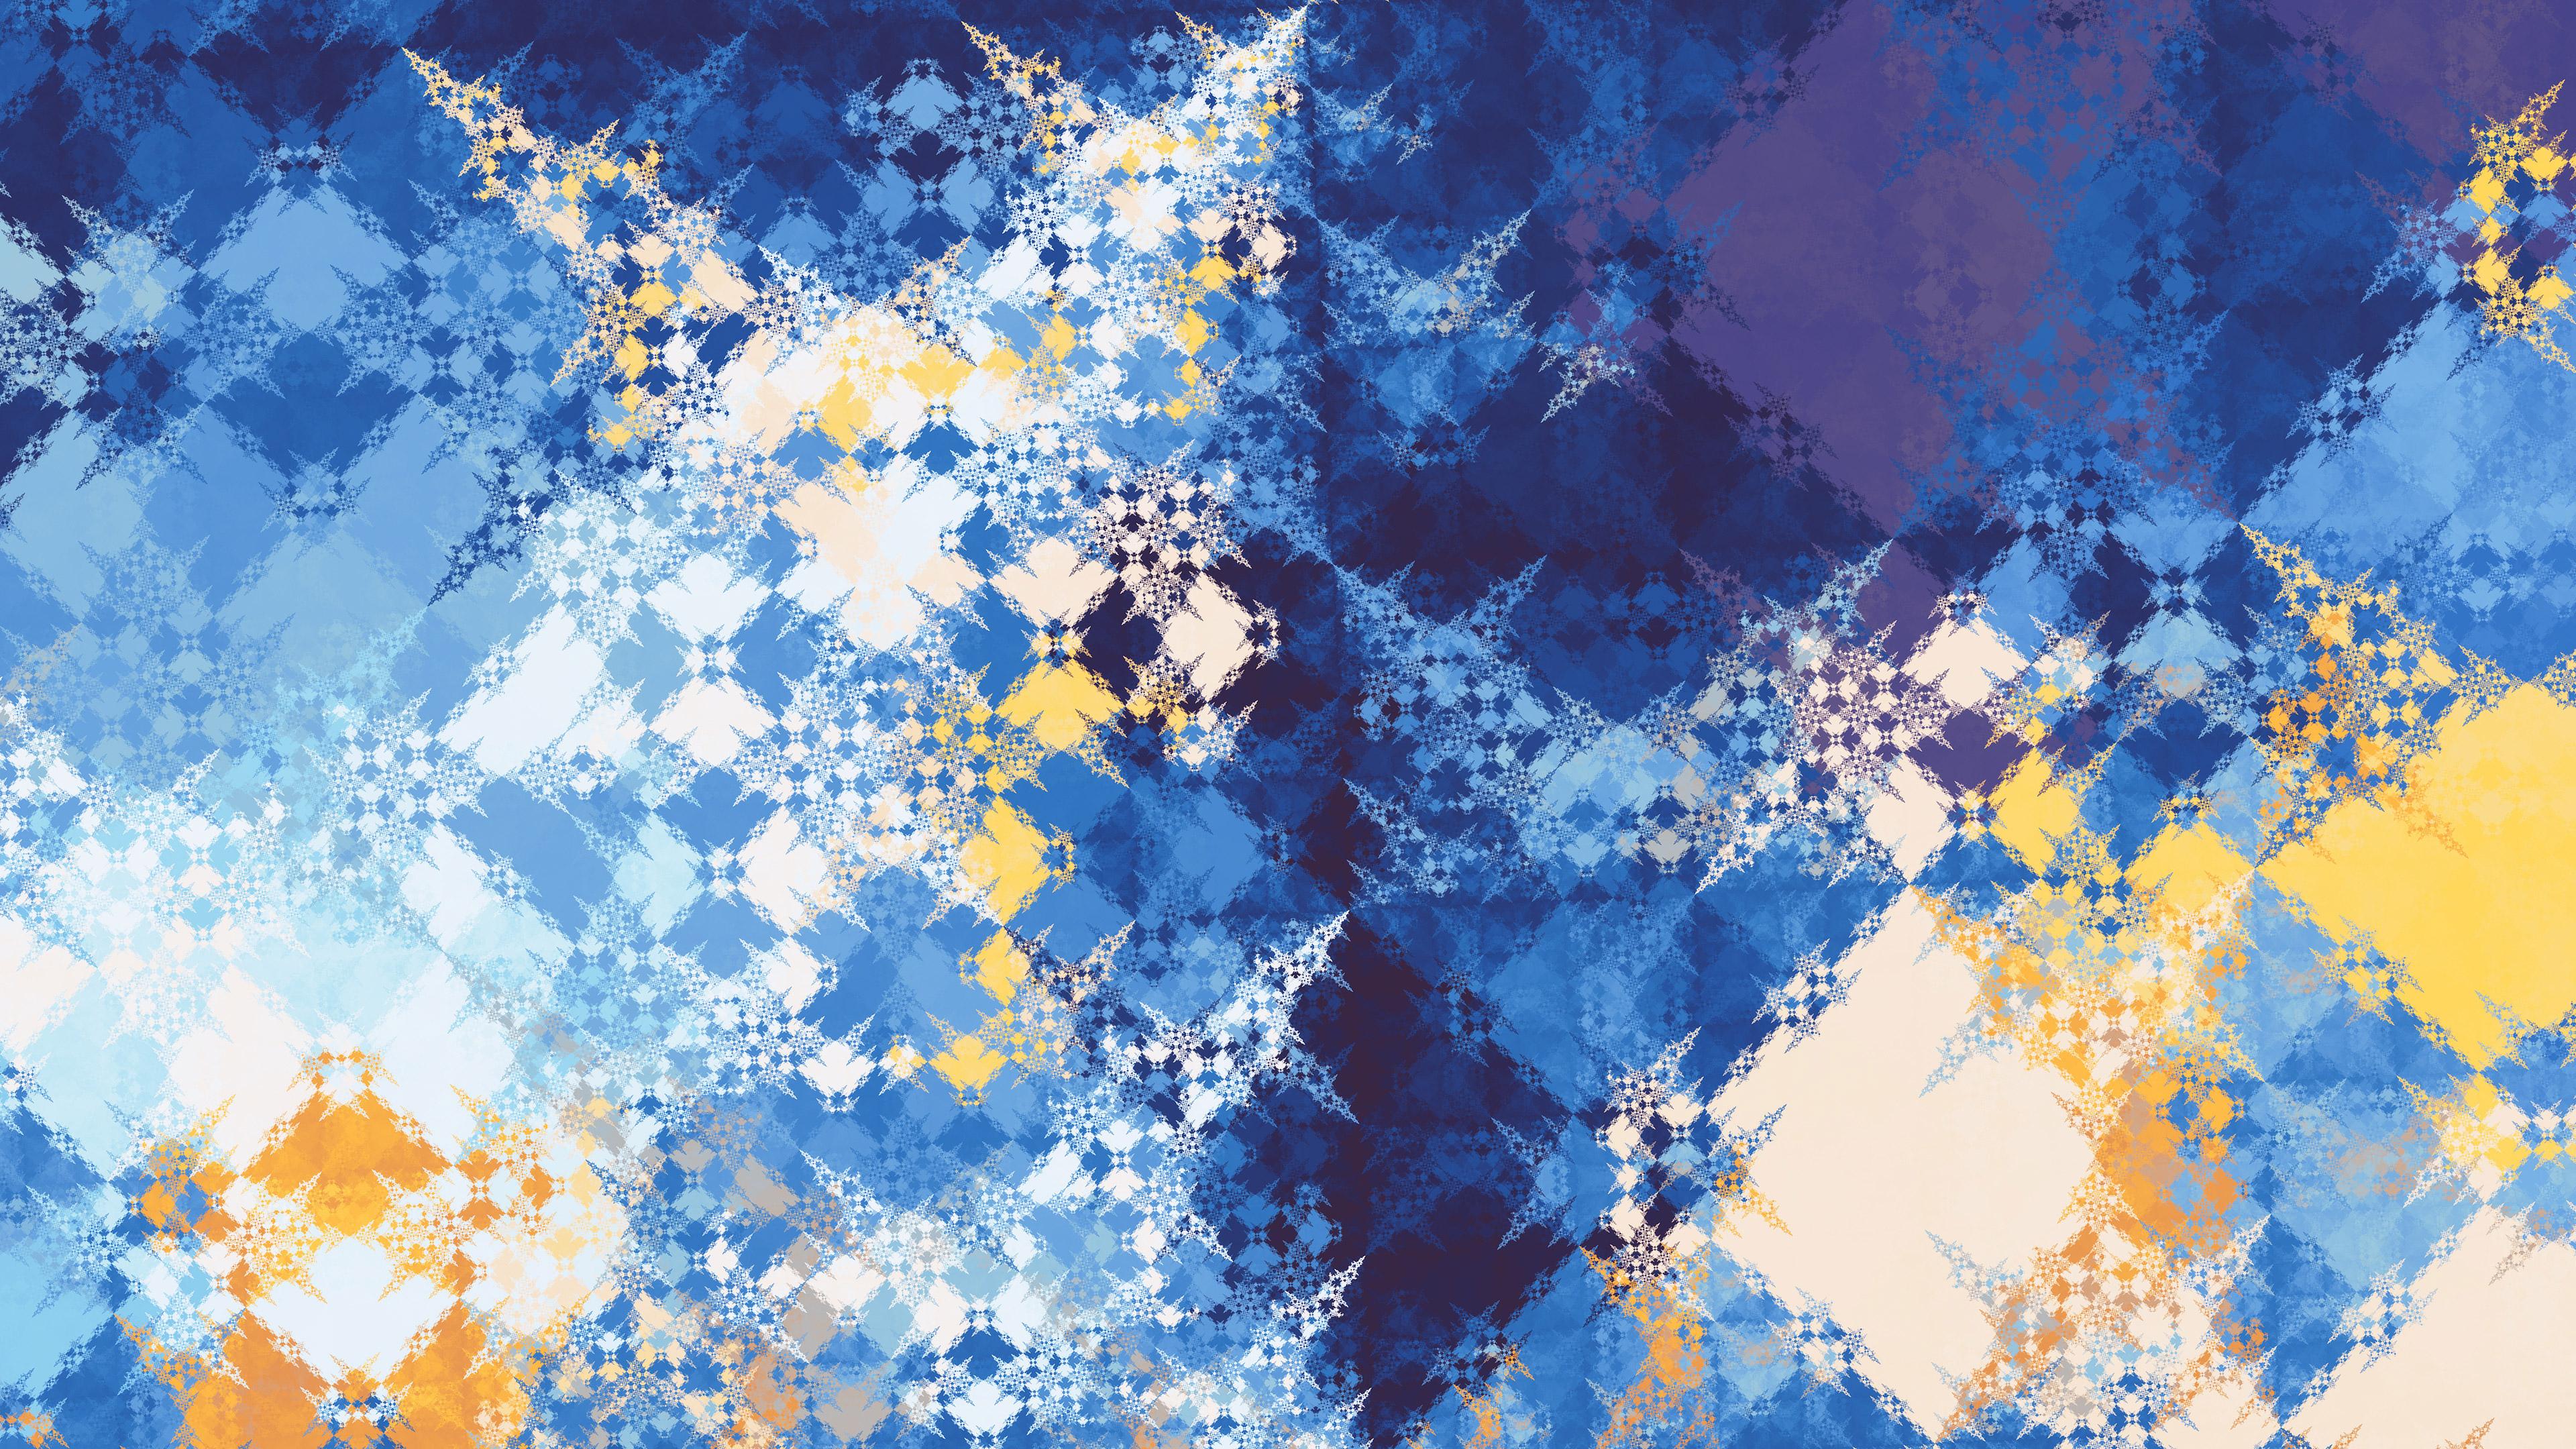 abstract fractal 4k 1539370823 - Abstract Fractal 4k - hd-wallpapers, abstract wallpapers, 4k-wallpapers